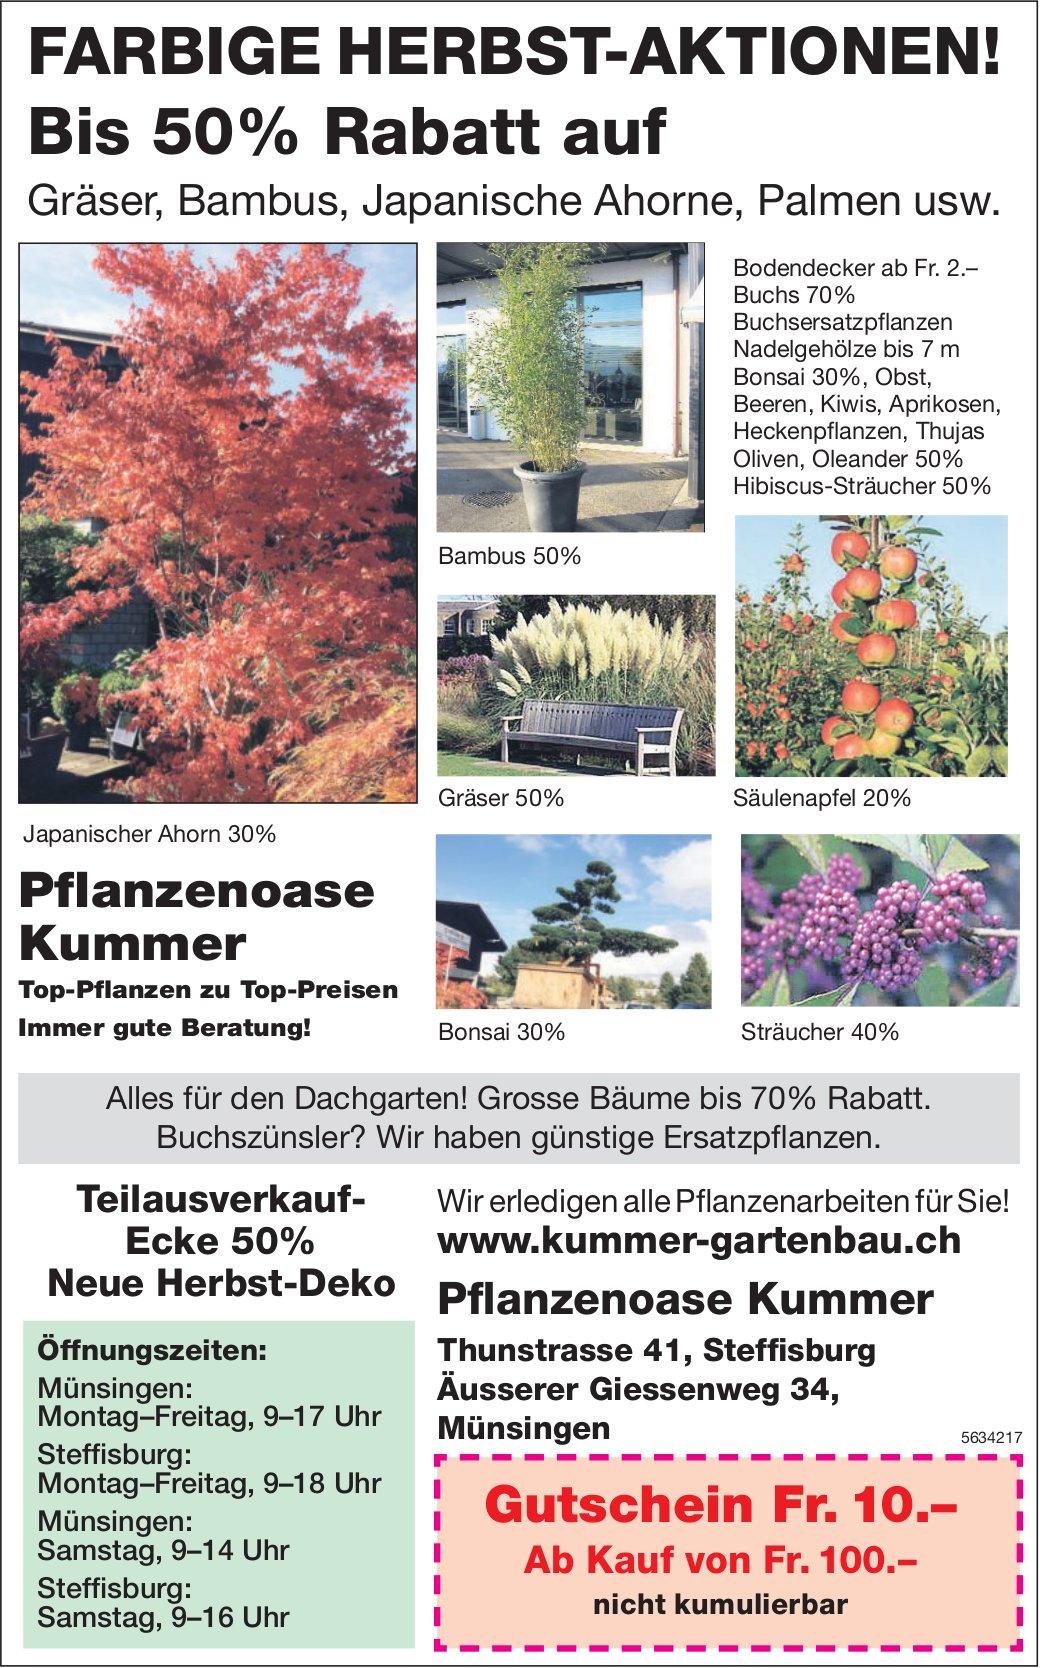 Pflanzenoase Kummer - FARBIGE HERBST-AKTIONEN!